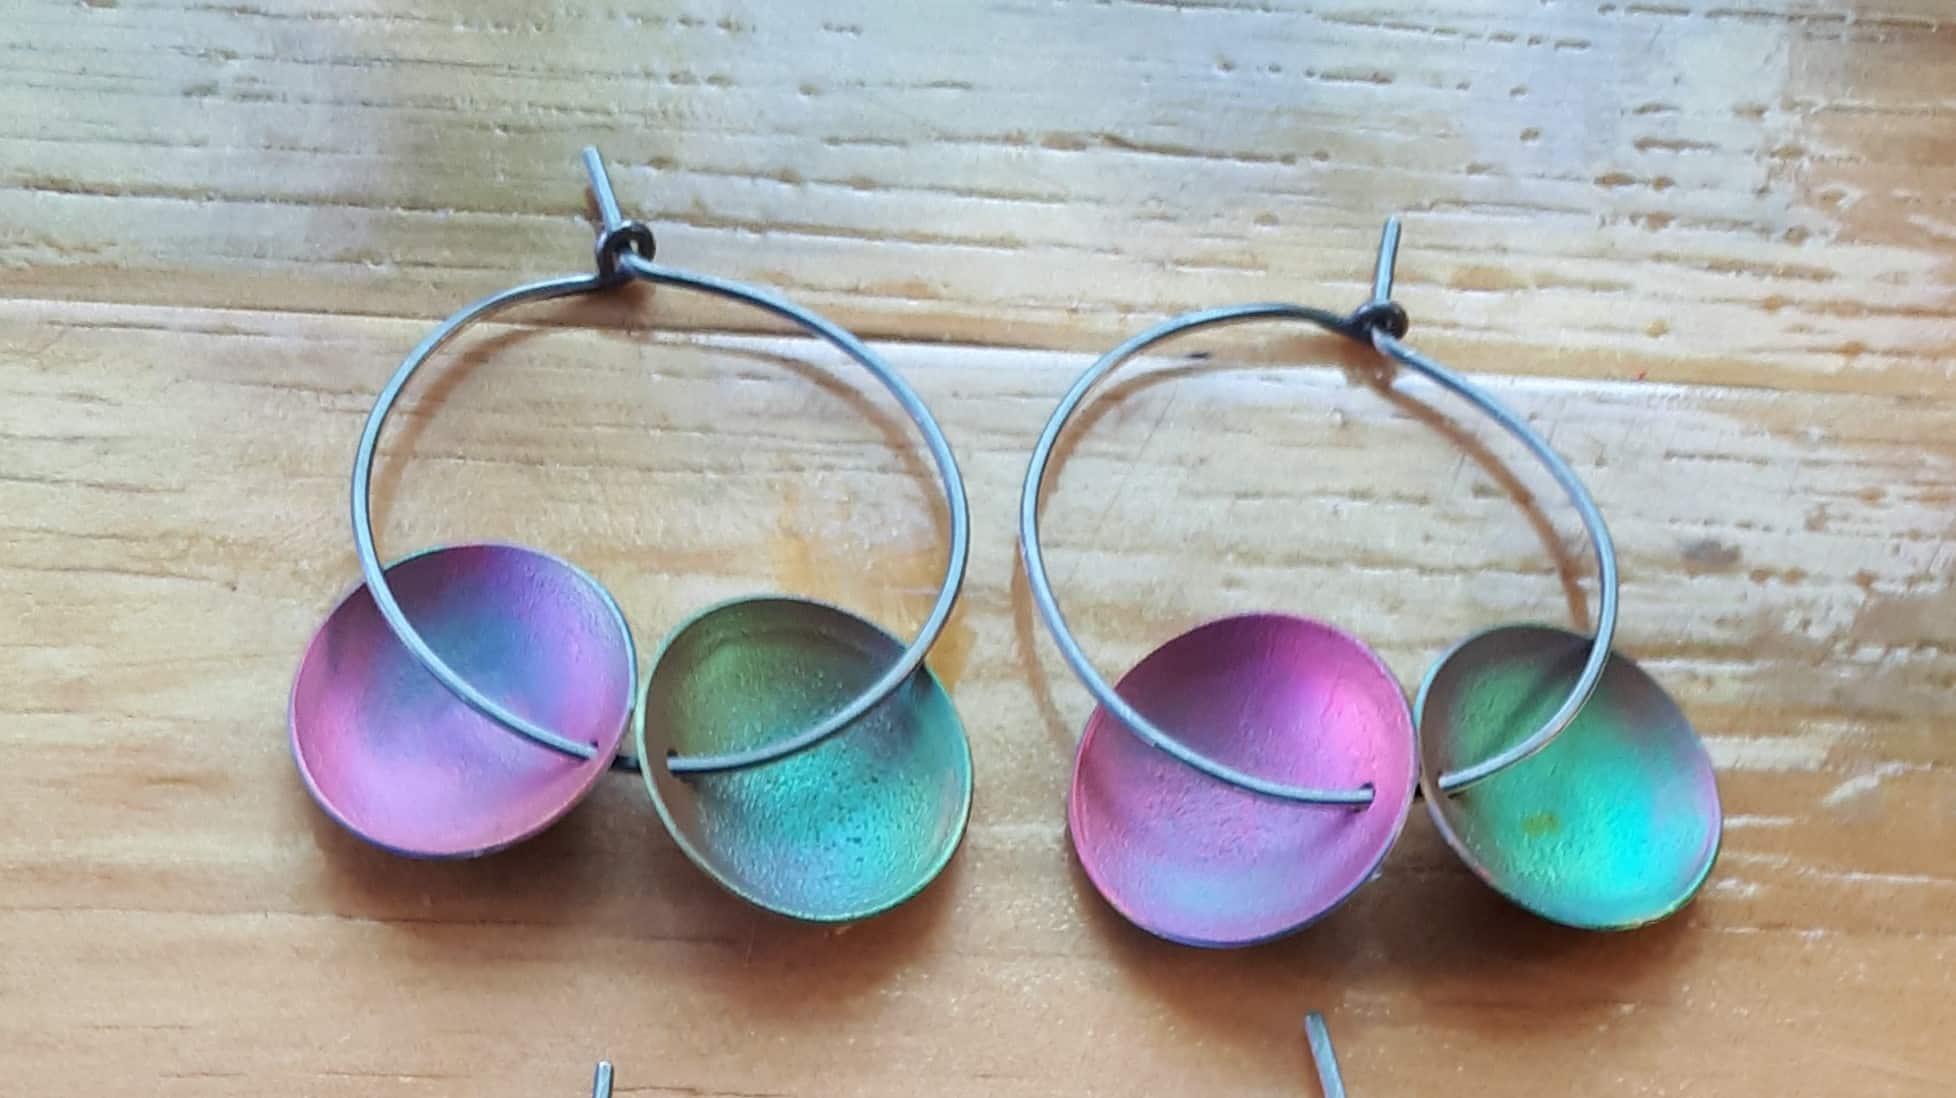 Double Dot Shibuichi Hoop Earrings 'Pink & Green' By Emma Hesz